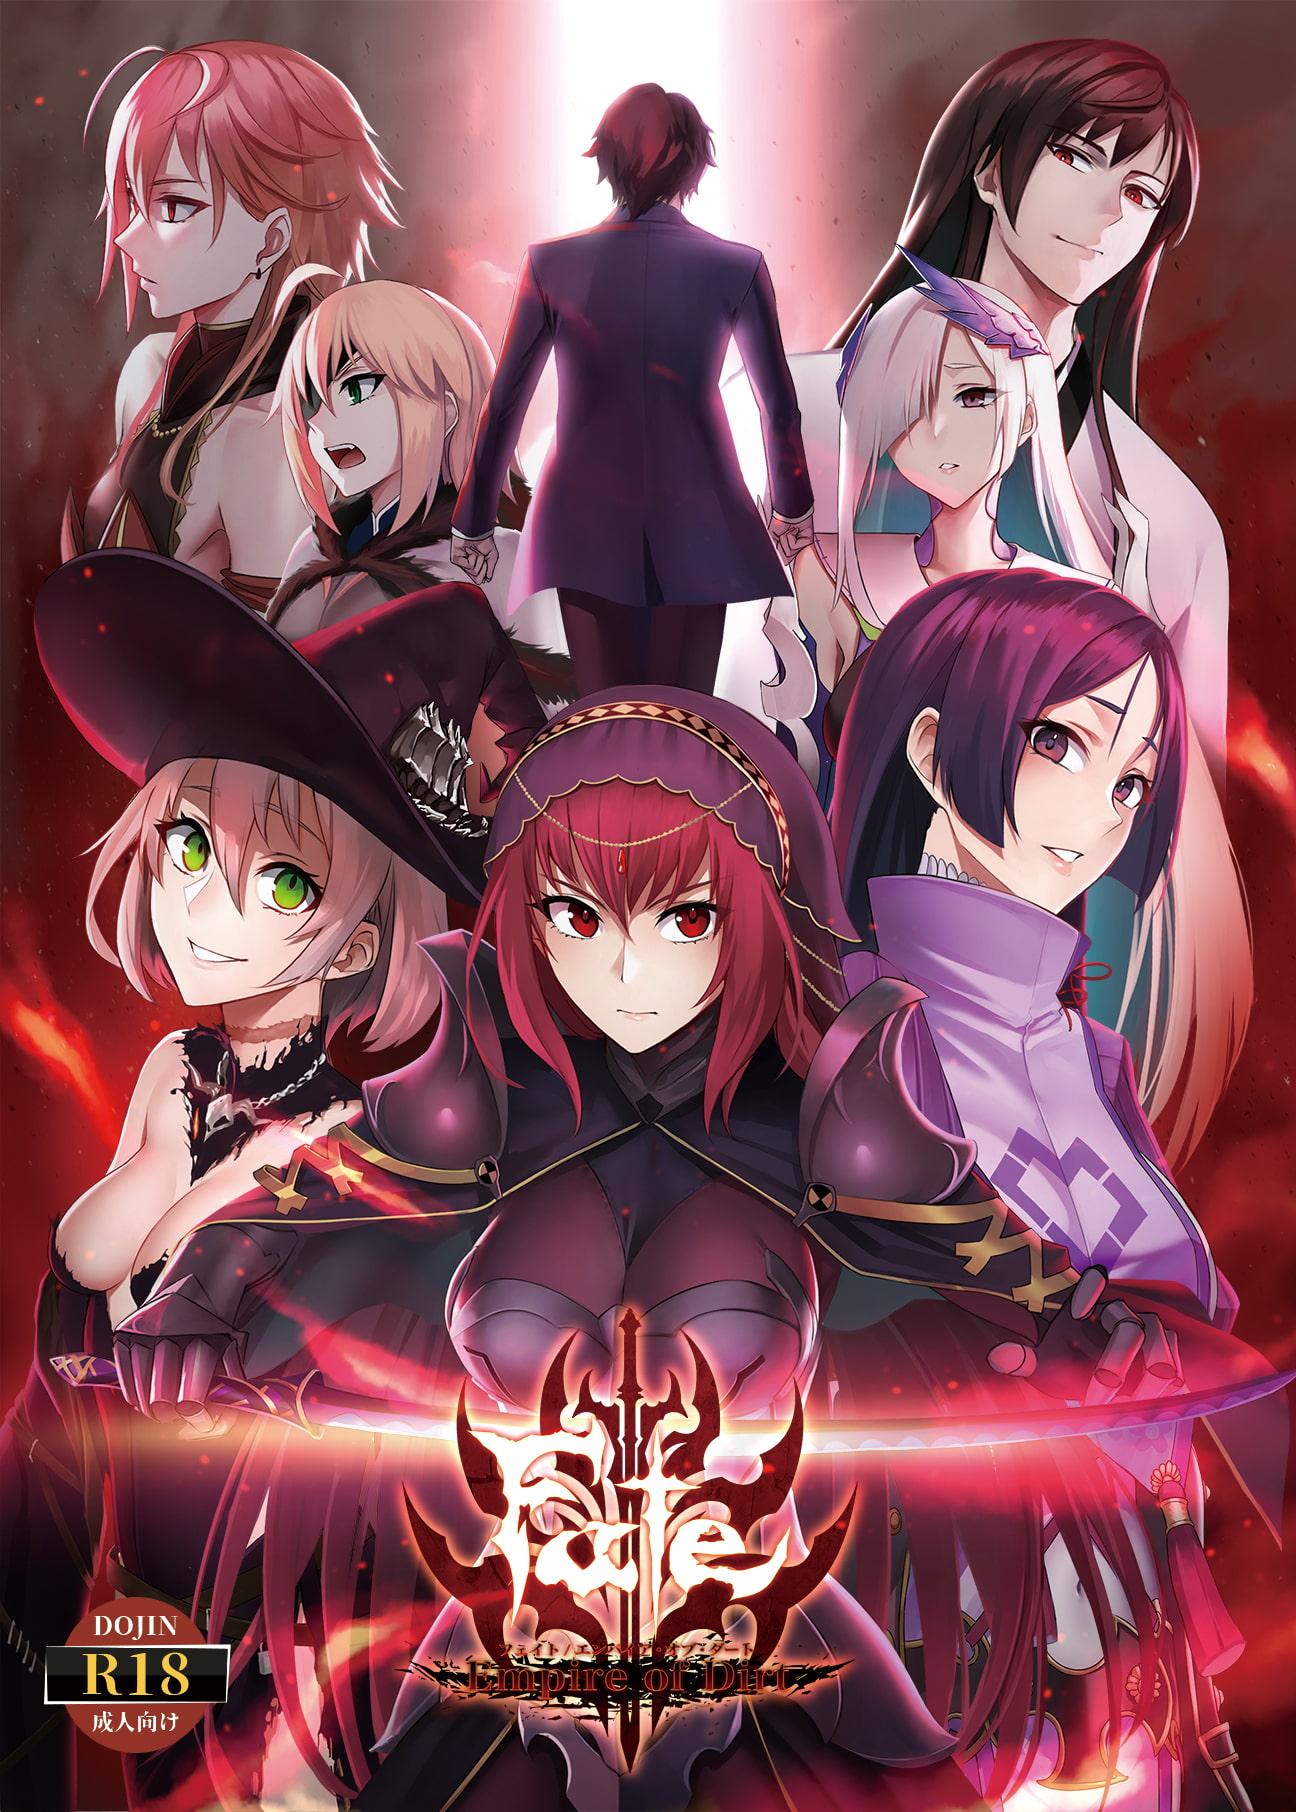 Fate/Empire of Dirt (Luwen Workshop) DLsite提供:同人ゲーム – ロールプレイング